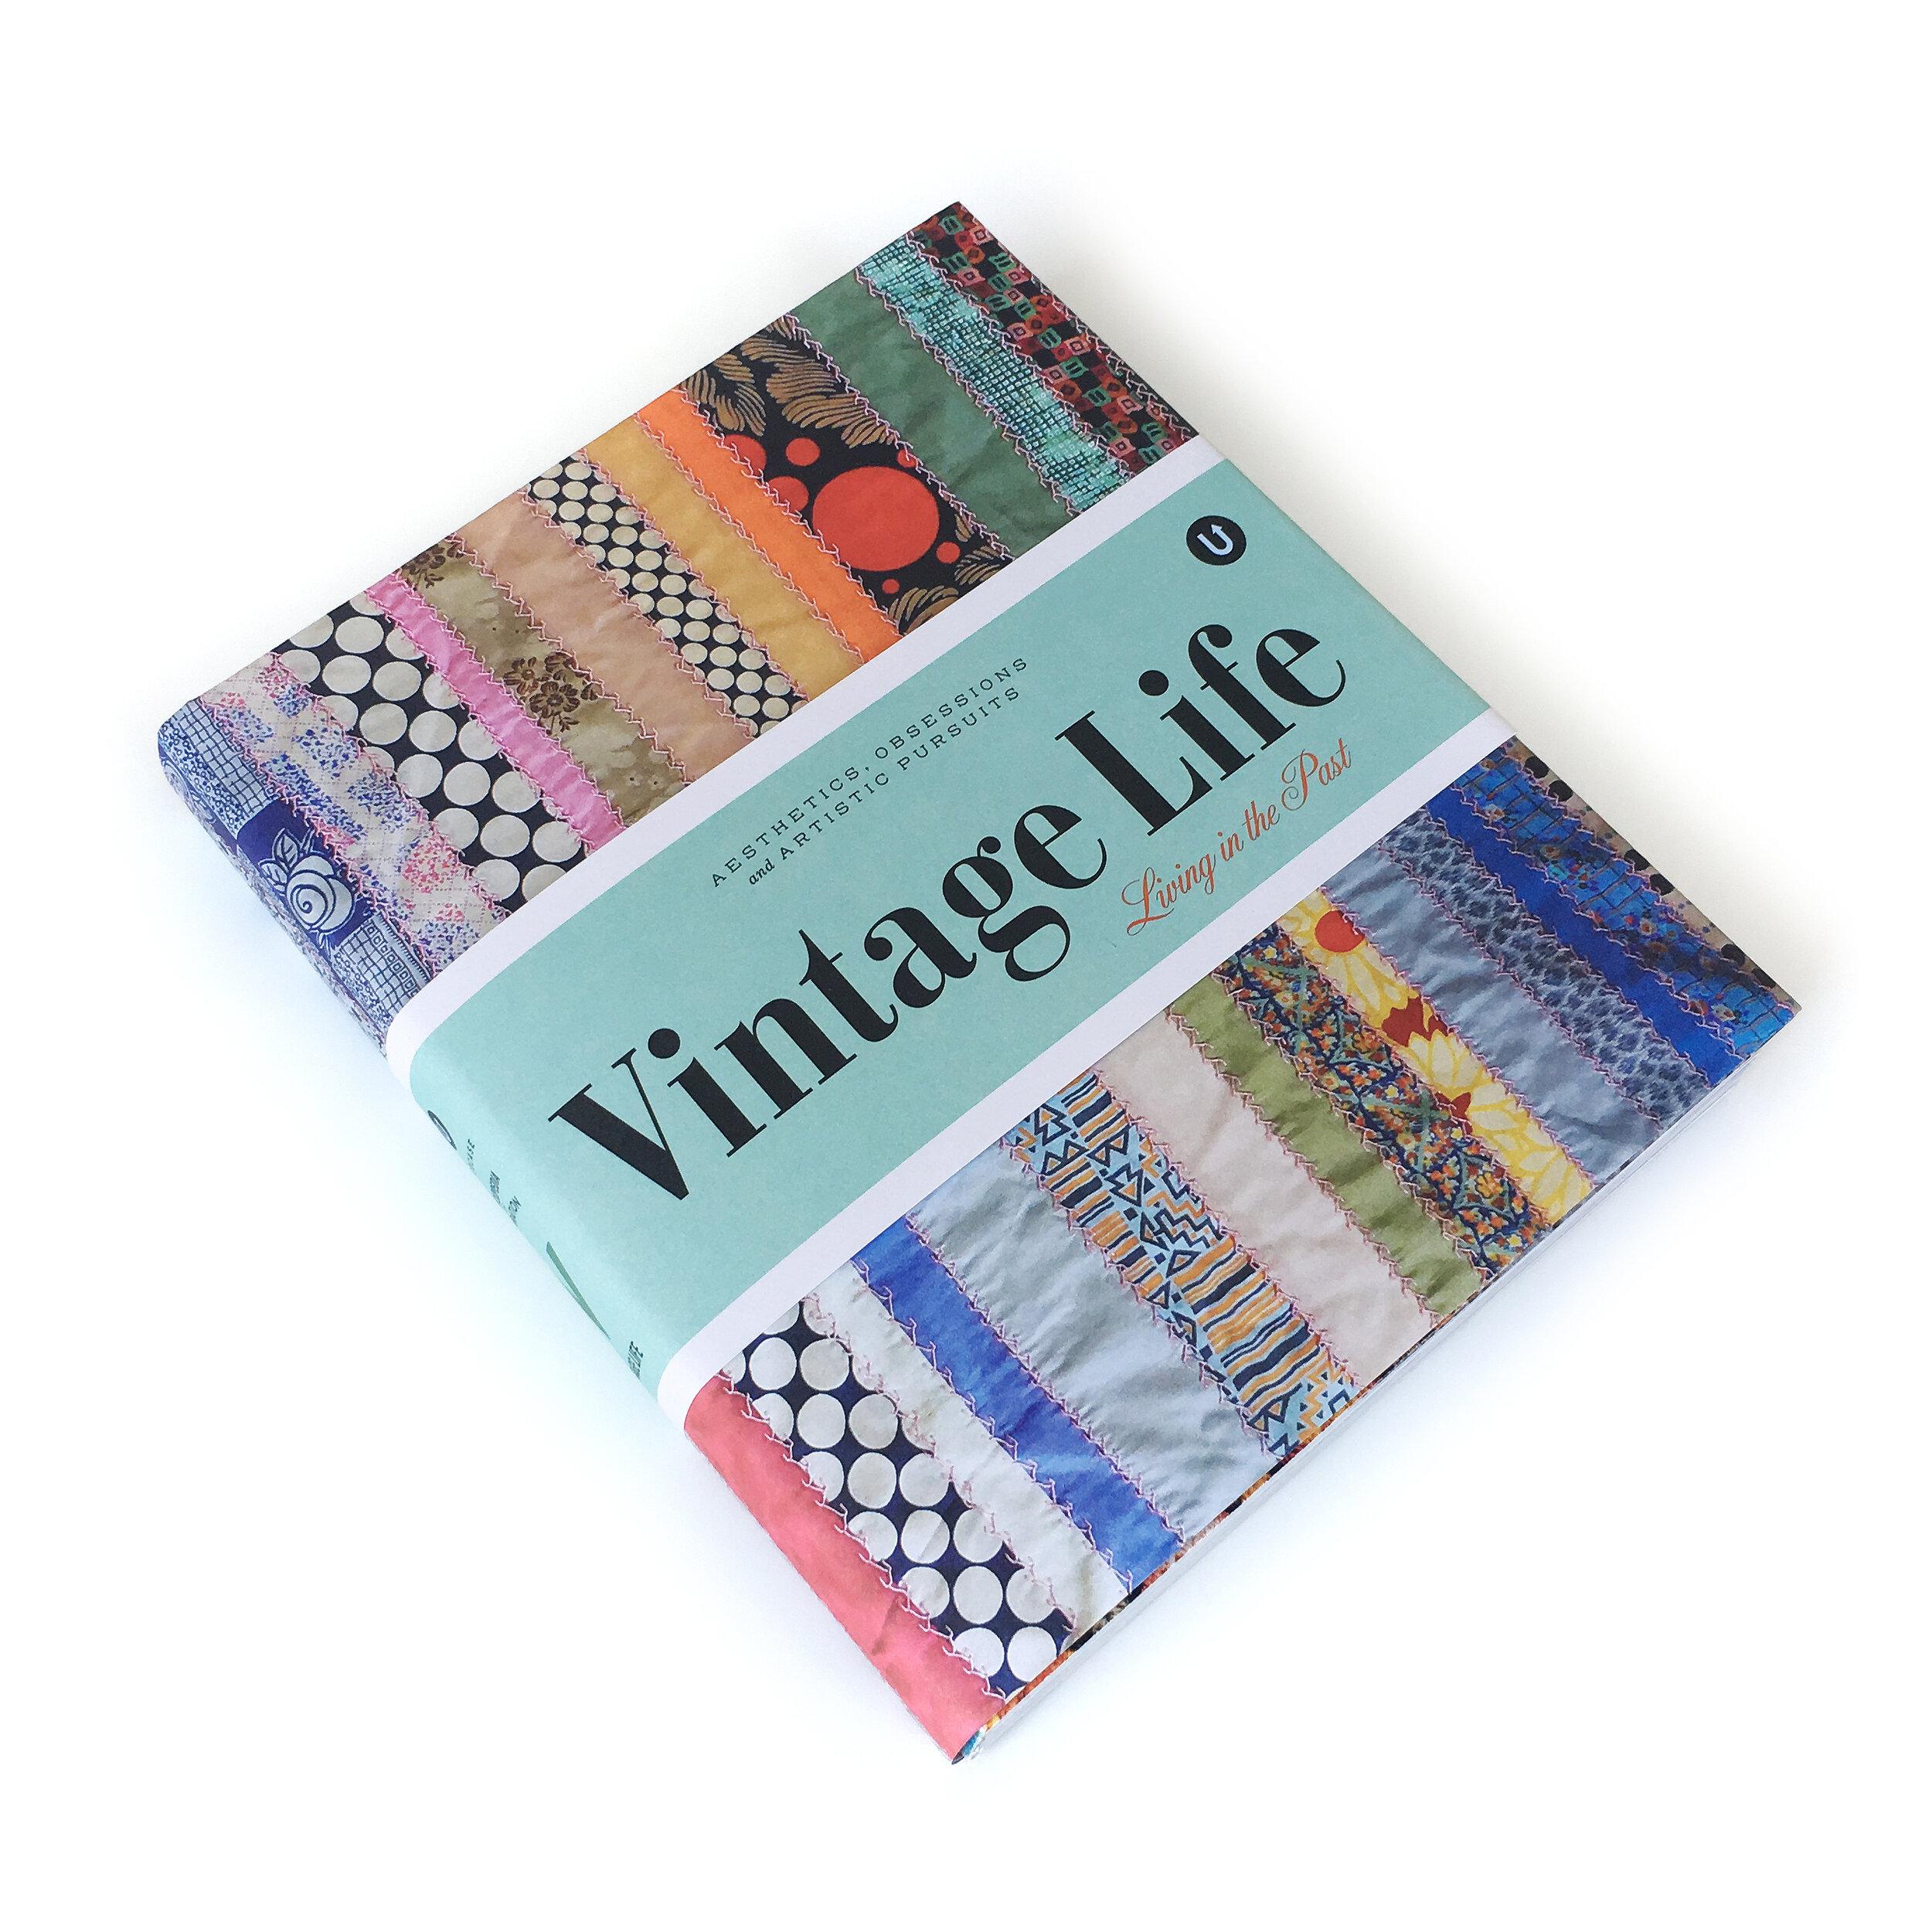 VintageLife-dustjackets-2.JPG